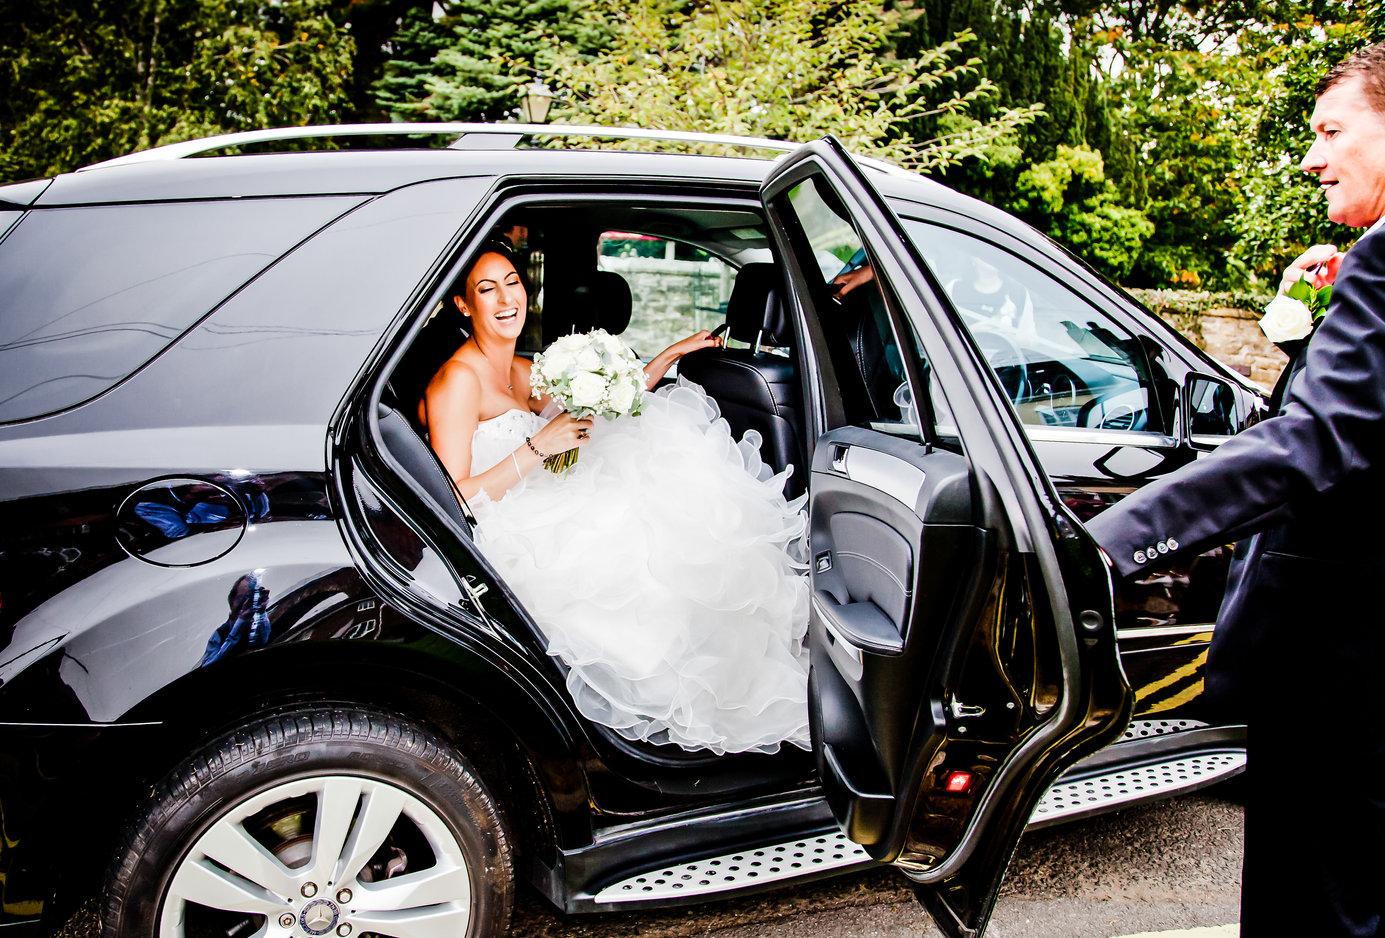 Wedding bride arriving